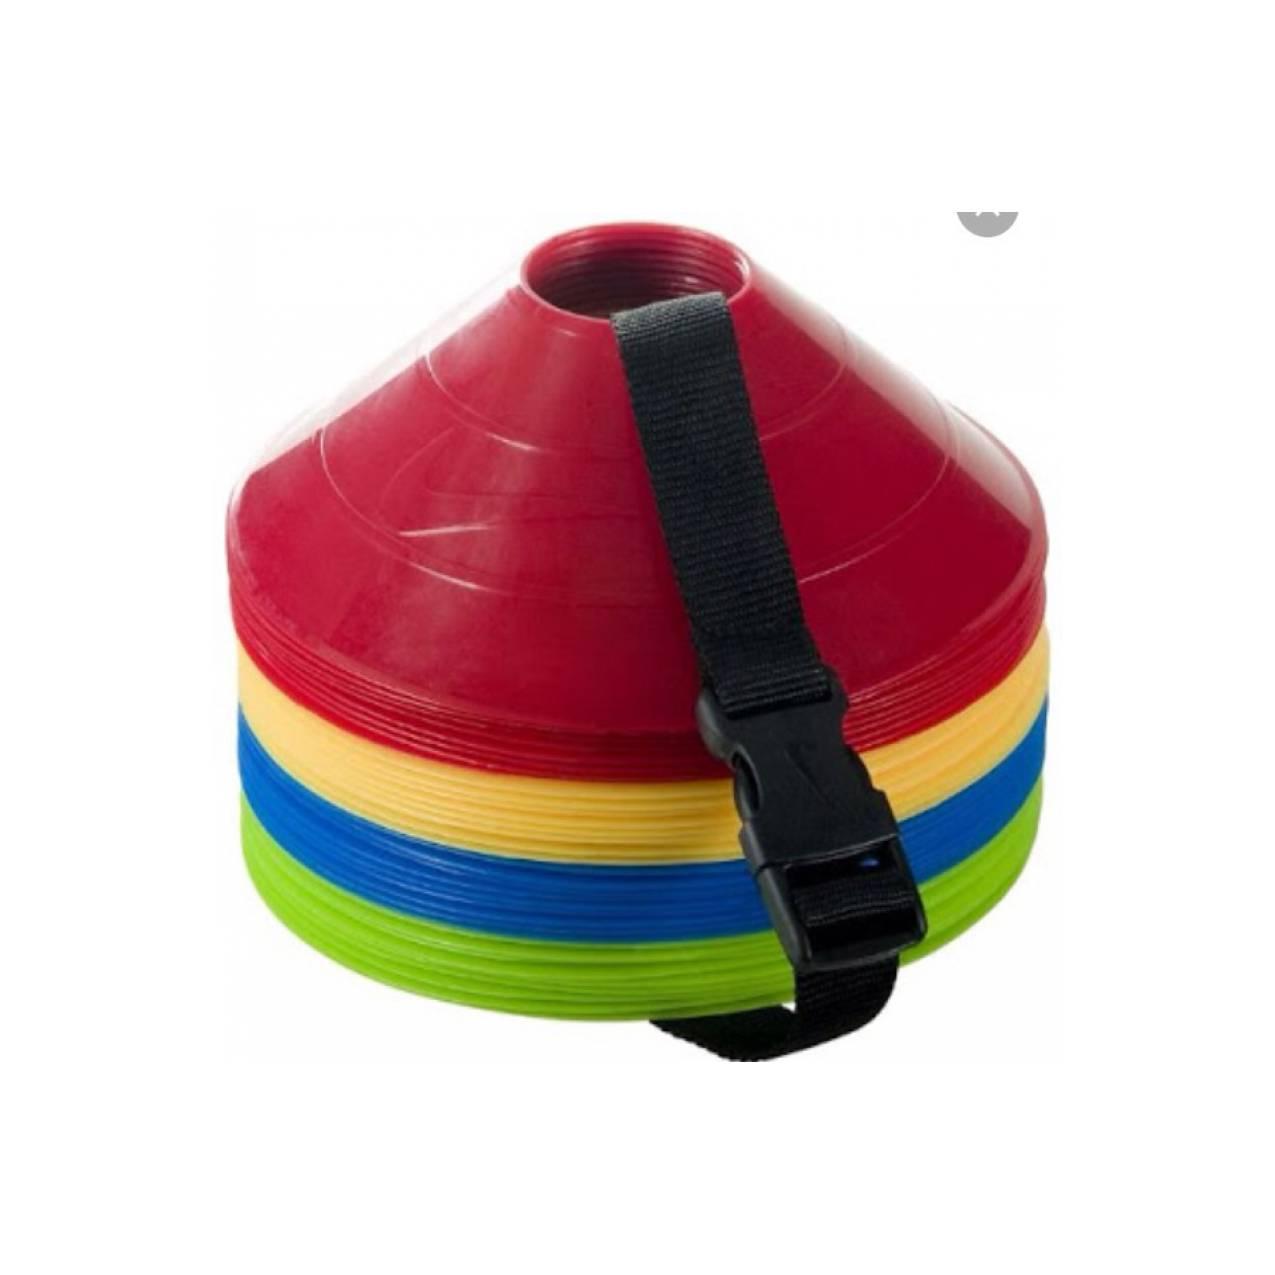 Nike training cones original kuns latihan futsal sepakbola authentic